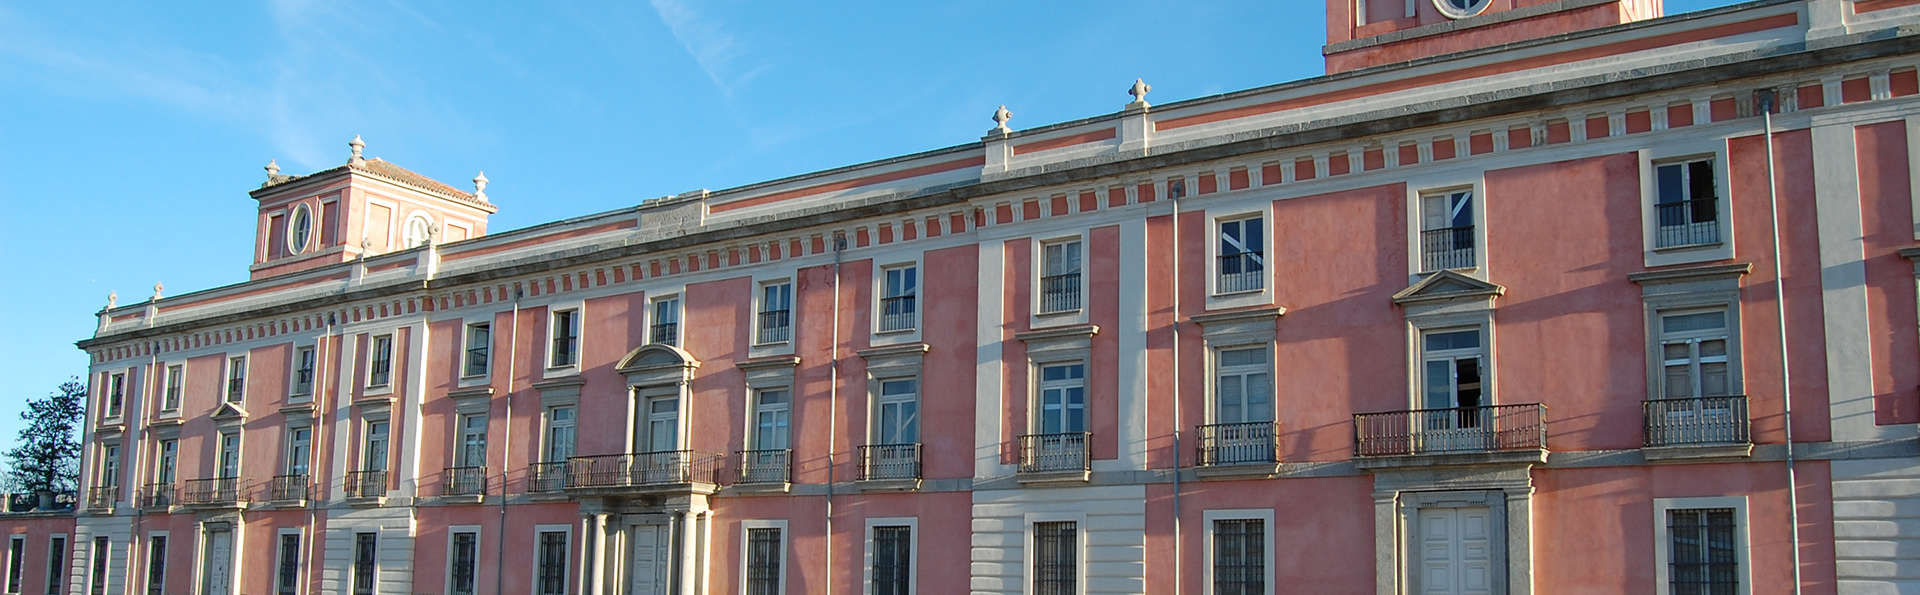 Turihotel Boadilla - edit_Palacio_infante_don_Luis_Boadilla.jpg